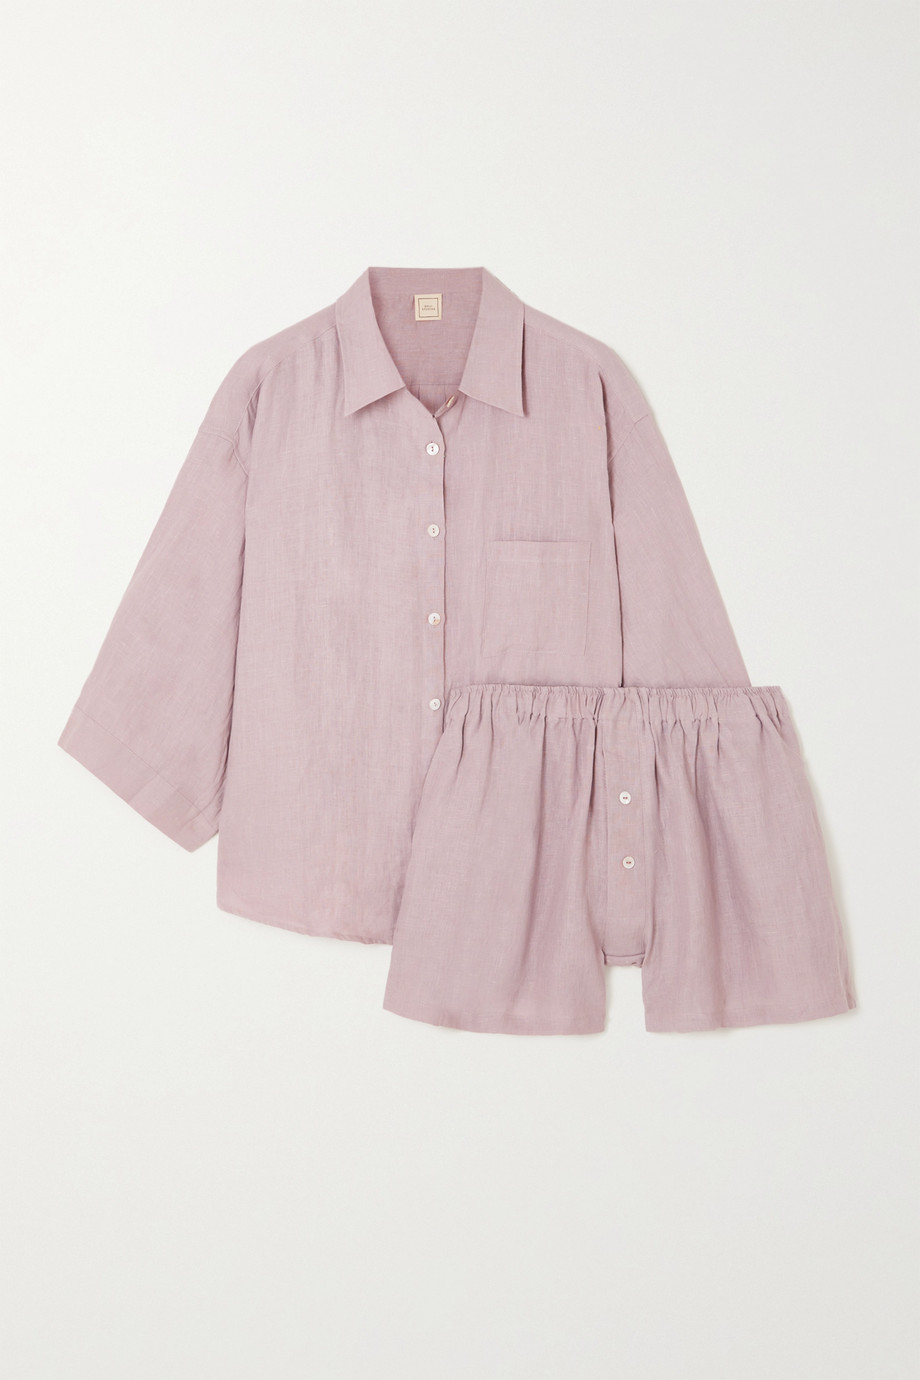 Deiji Studios The 03 washed-linen shirt and shorts set